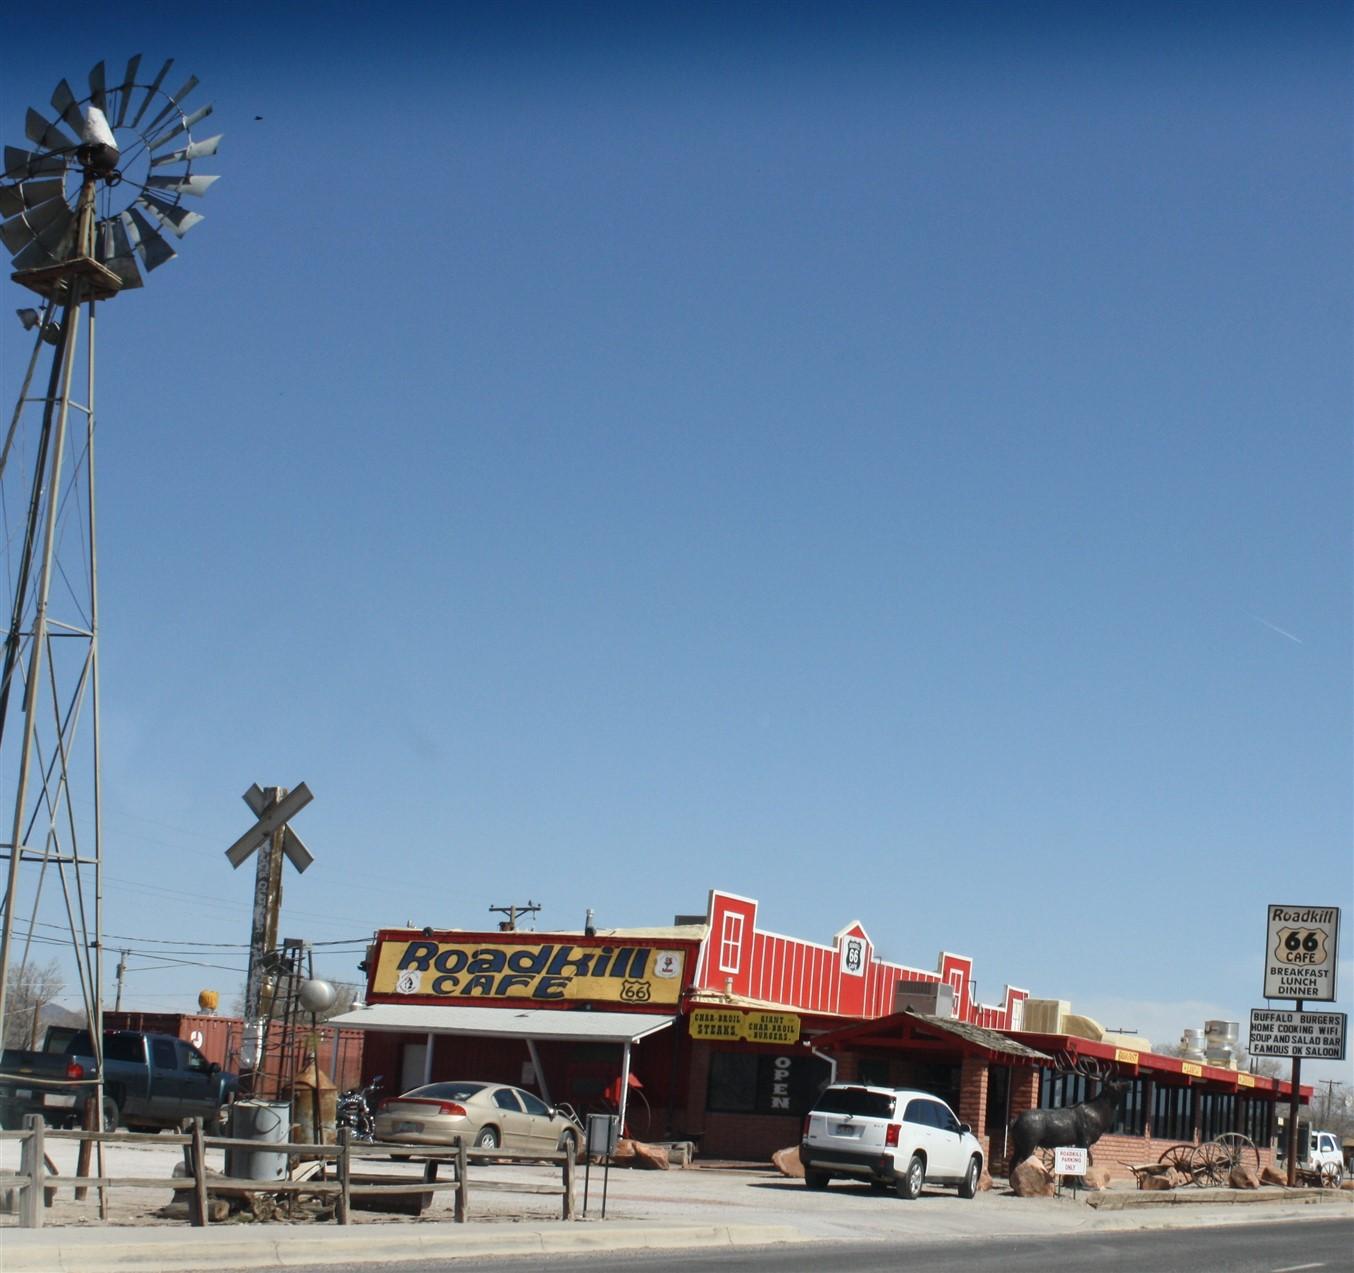 2012 03 14 Route 66 Road Trip 175 Seligman Arizona.jpg